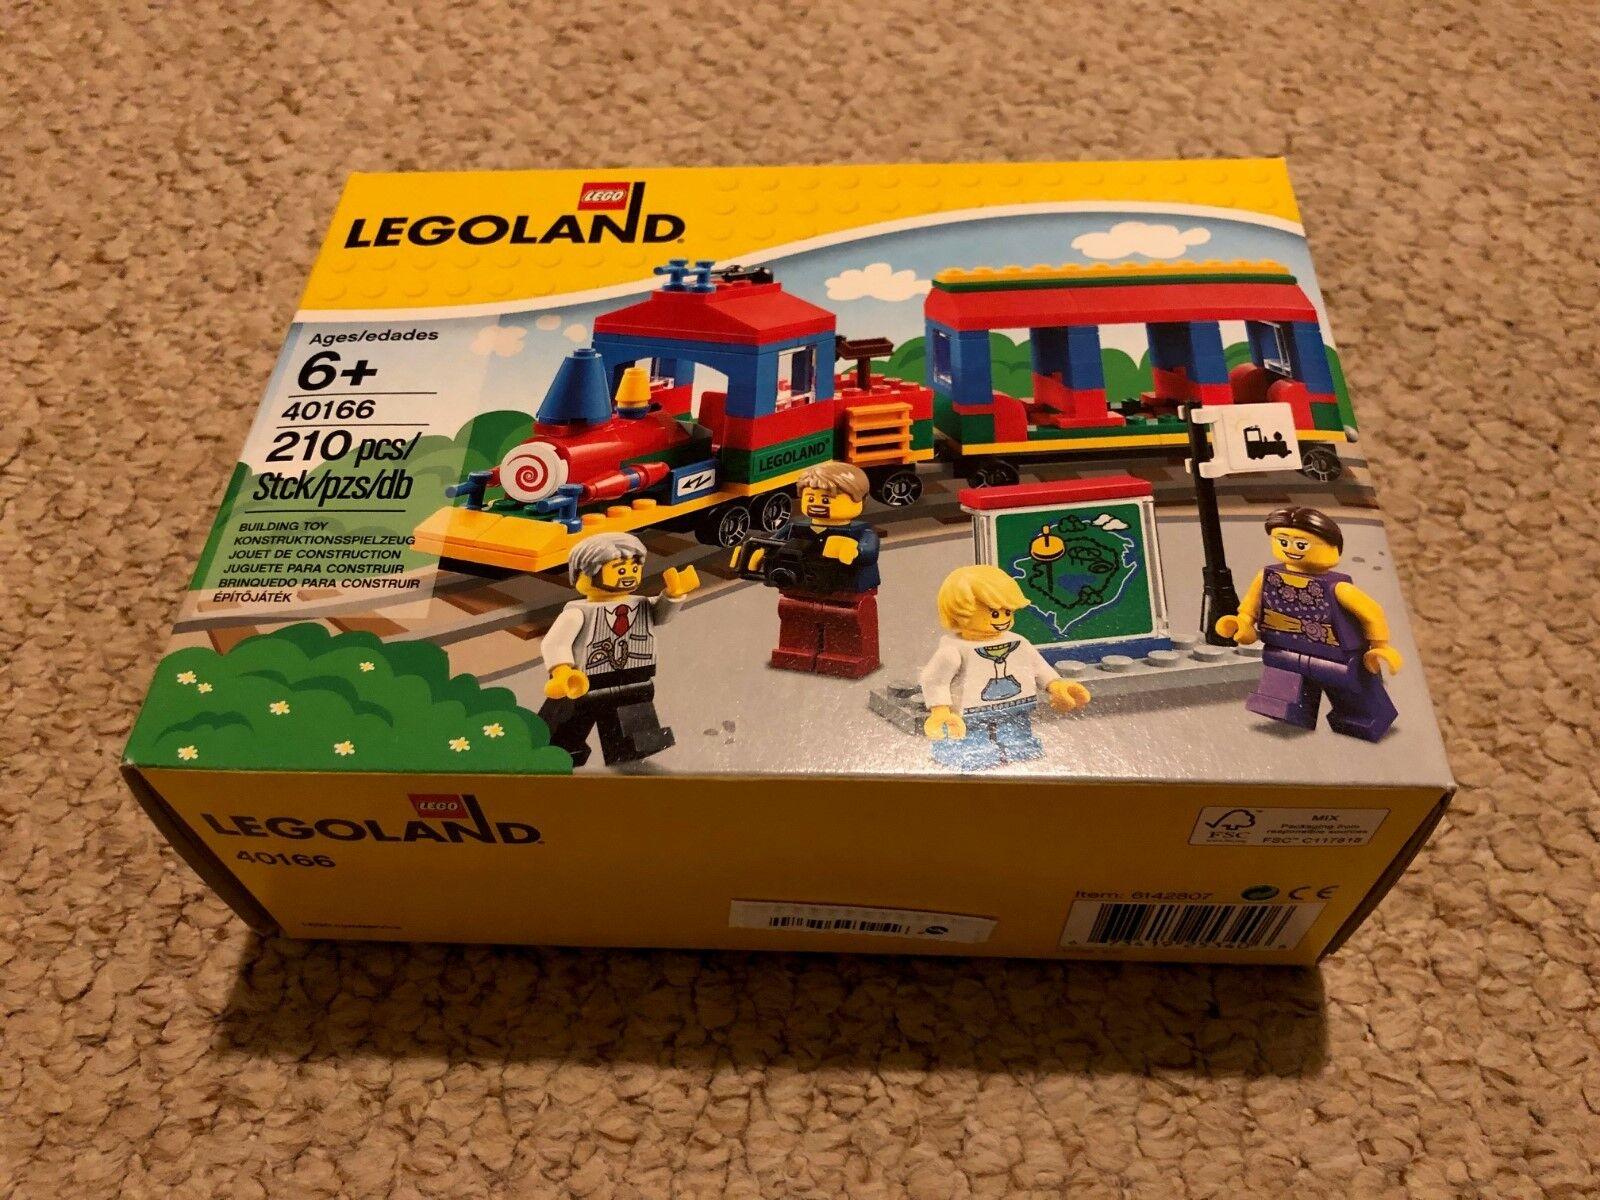 LEGO Legoland Exclusive (40166) Train - RARE, BRAND NEW & SEALED